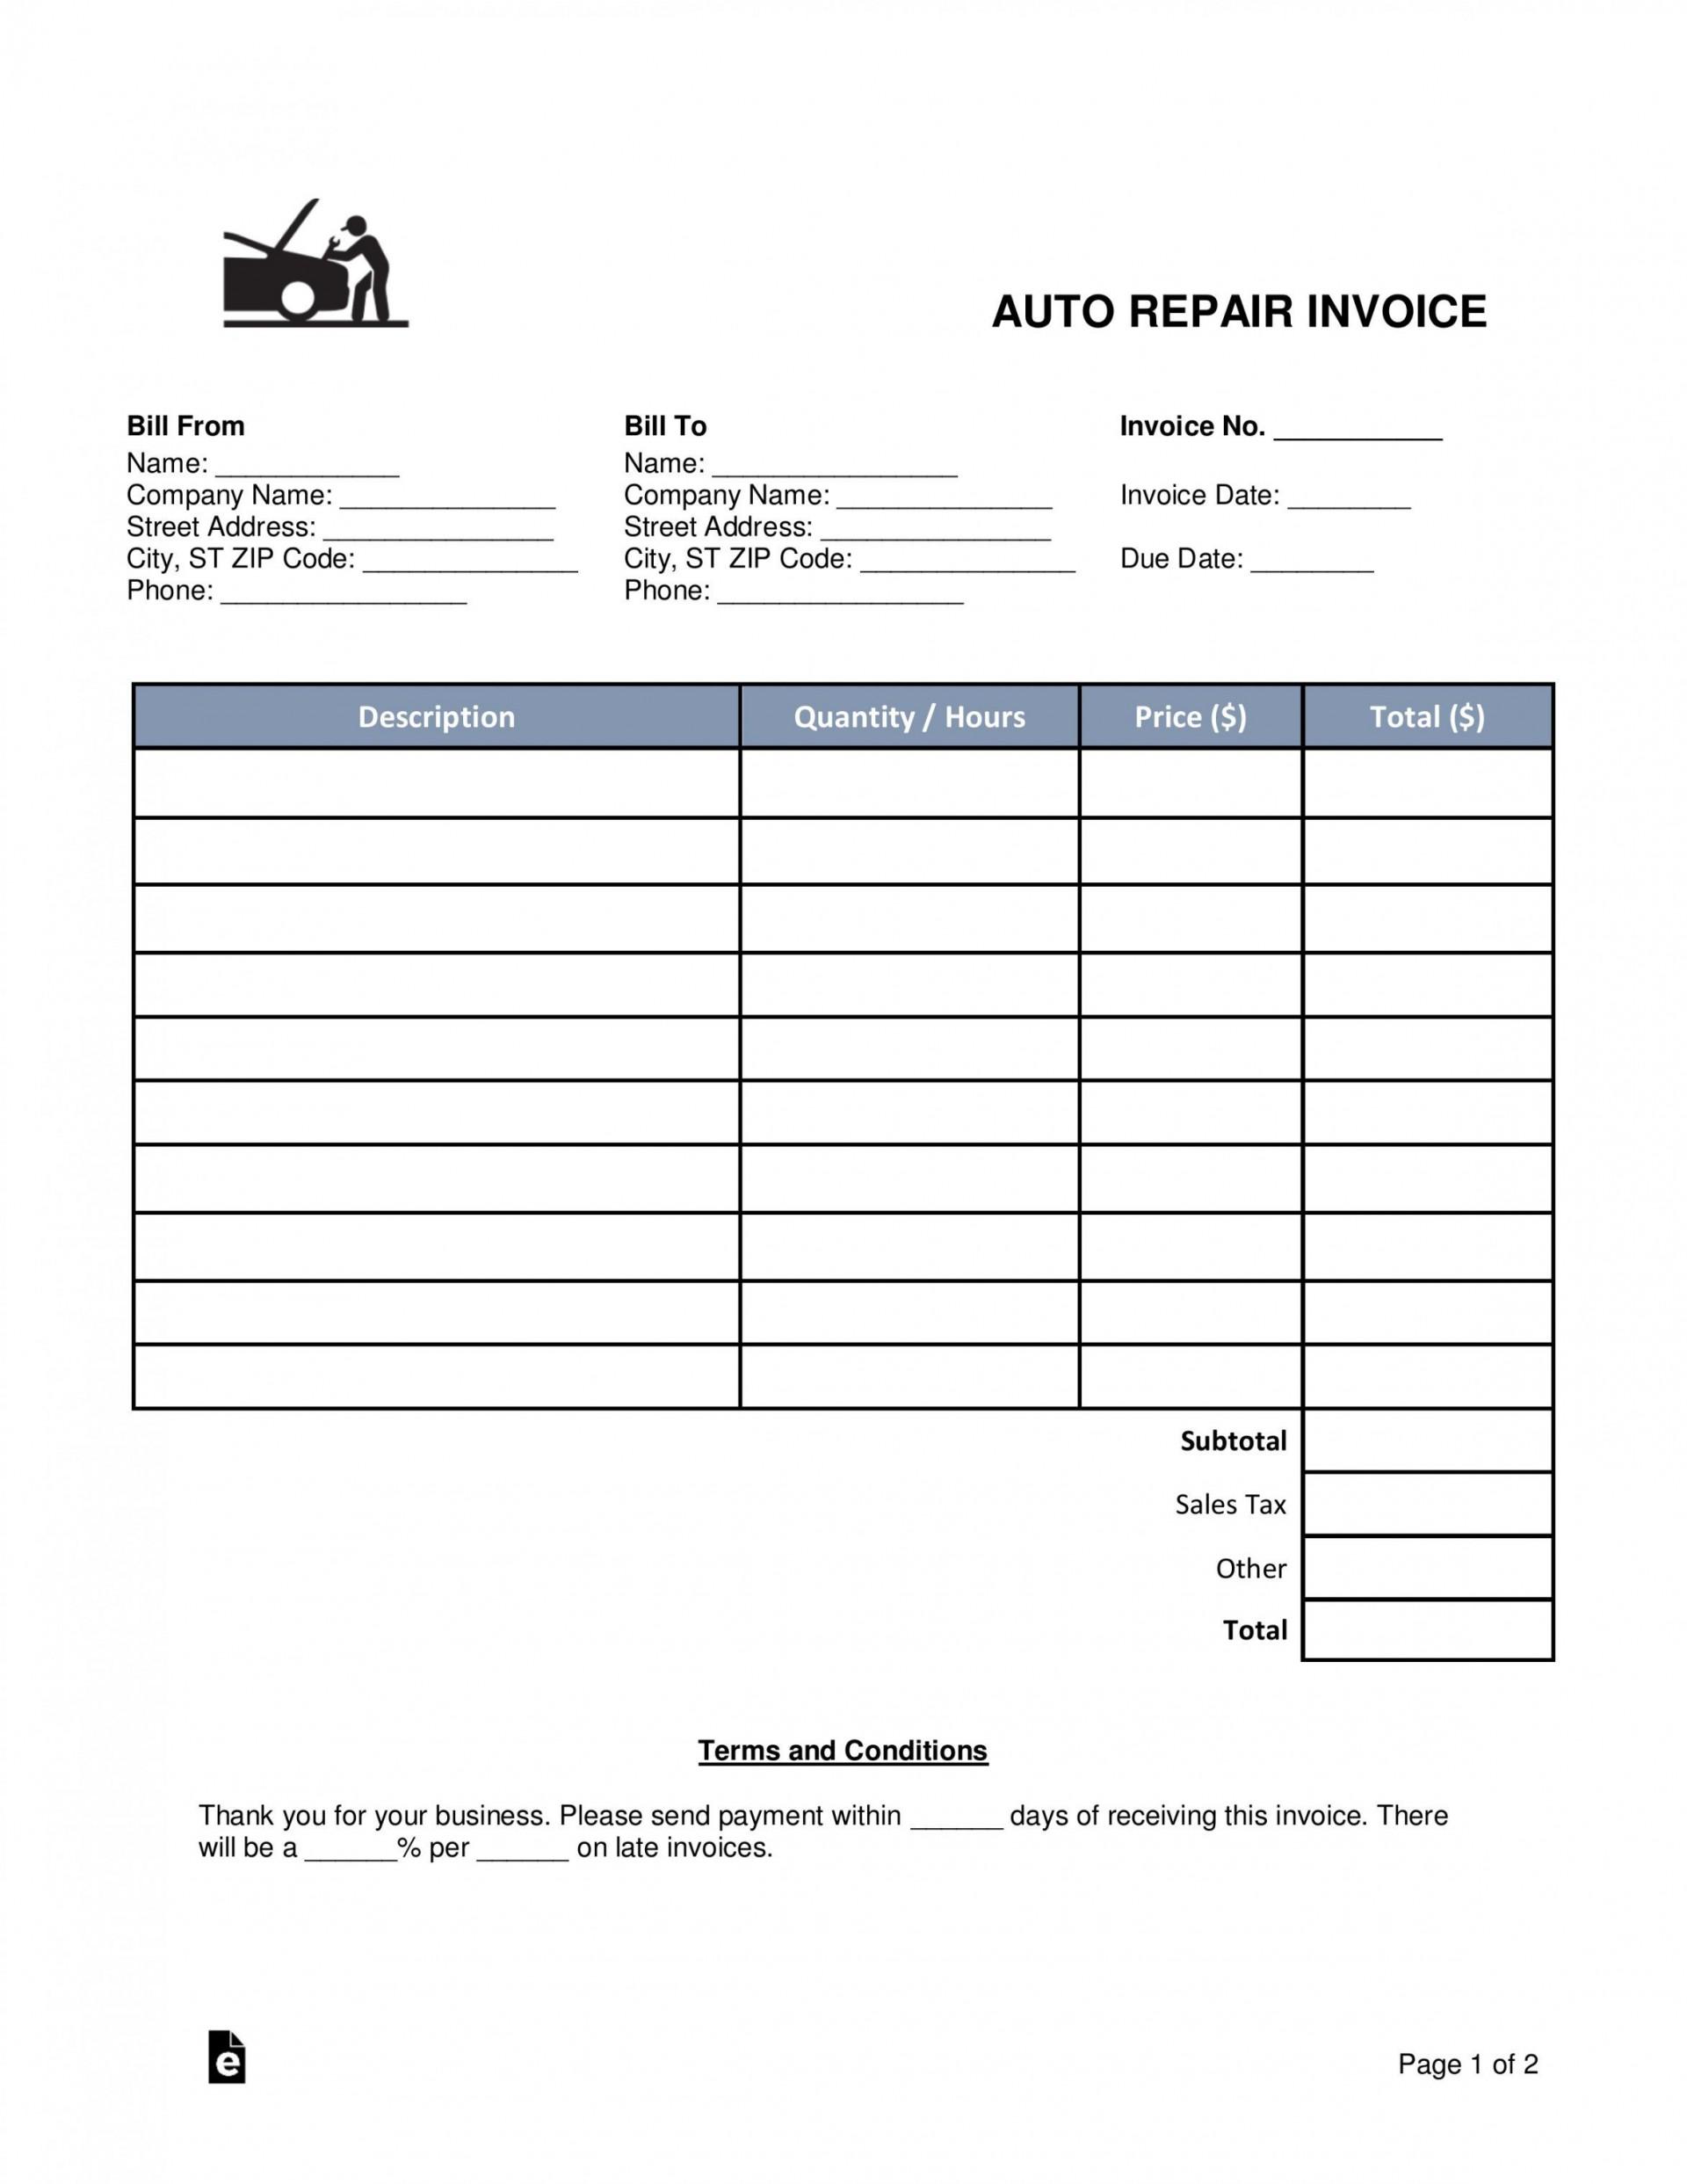 002 Surprising Auto Repair Work Order Template Excel Free Photo 1920